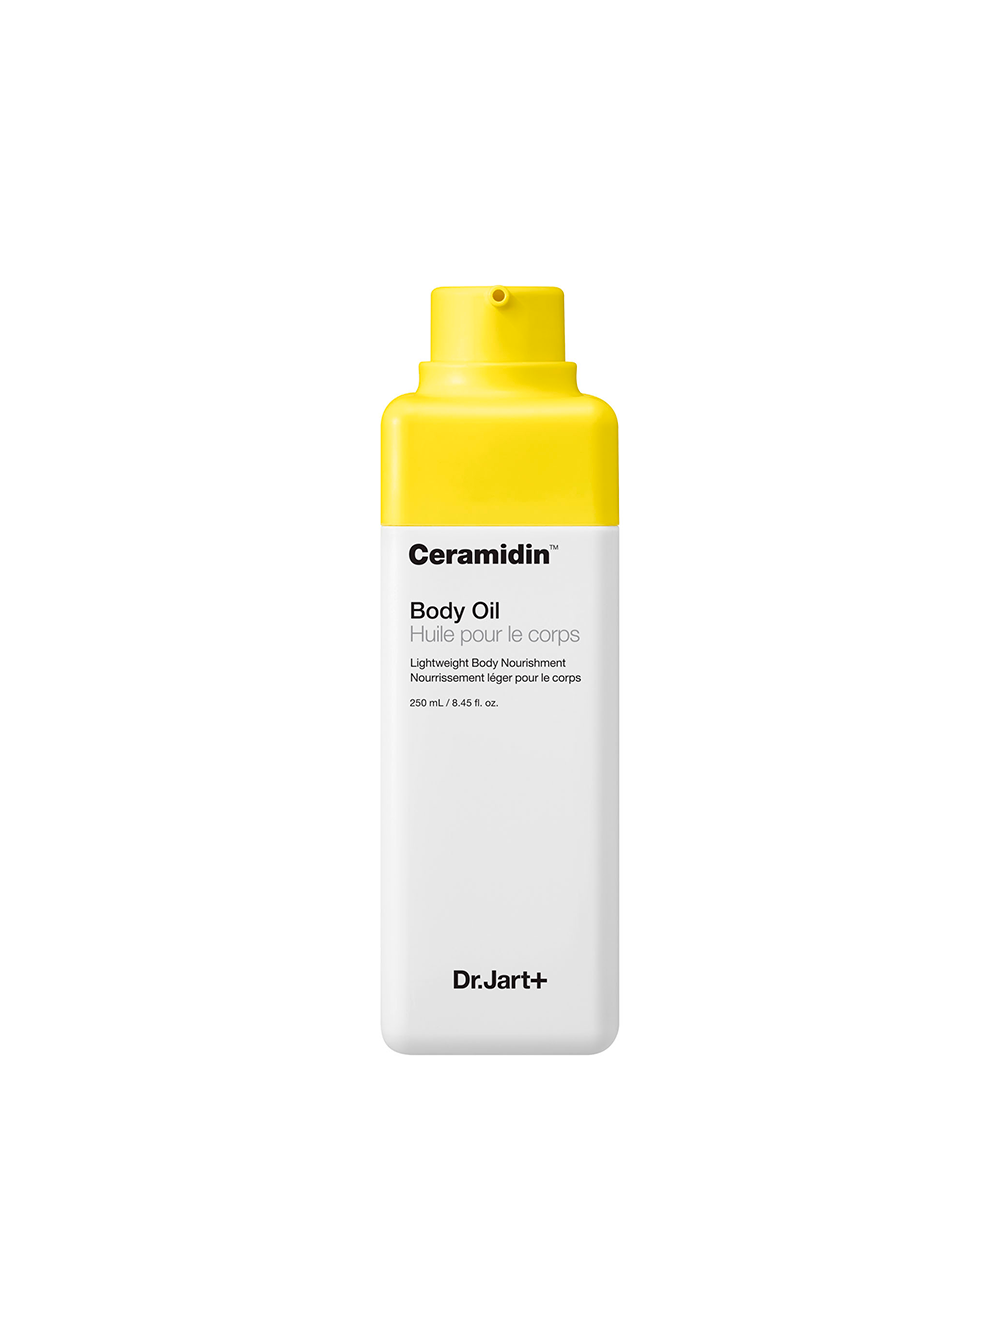 Dr.Jart+ Масло для Тела Ceramidin Body Oil, 250 мл dr jart ceramidin лосьон для тела ceramidin лосьон для тела